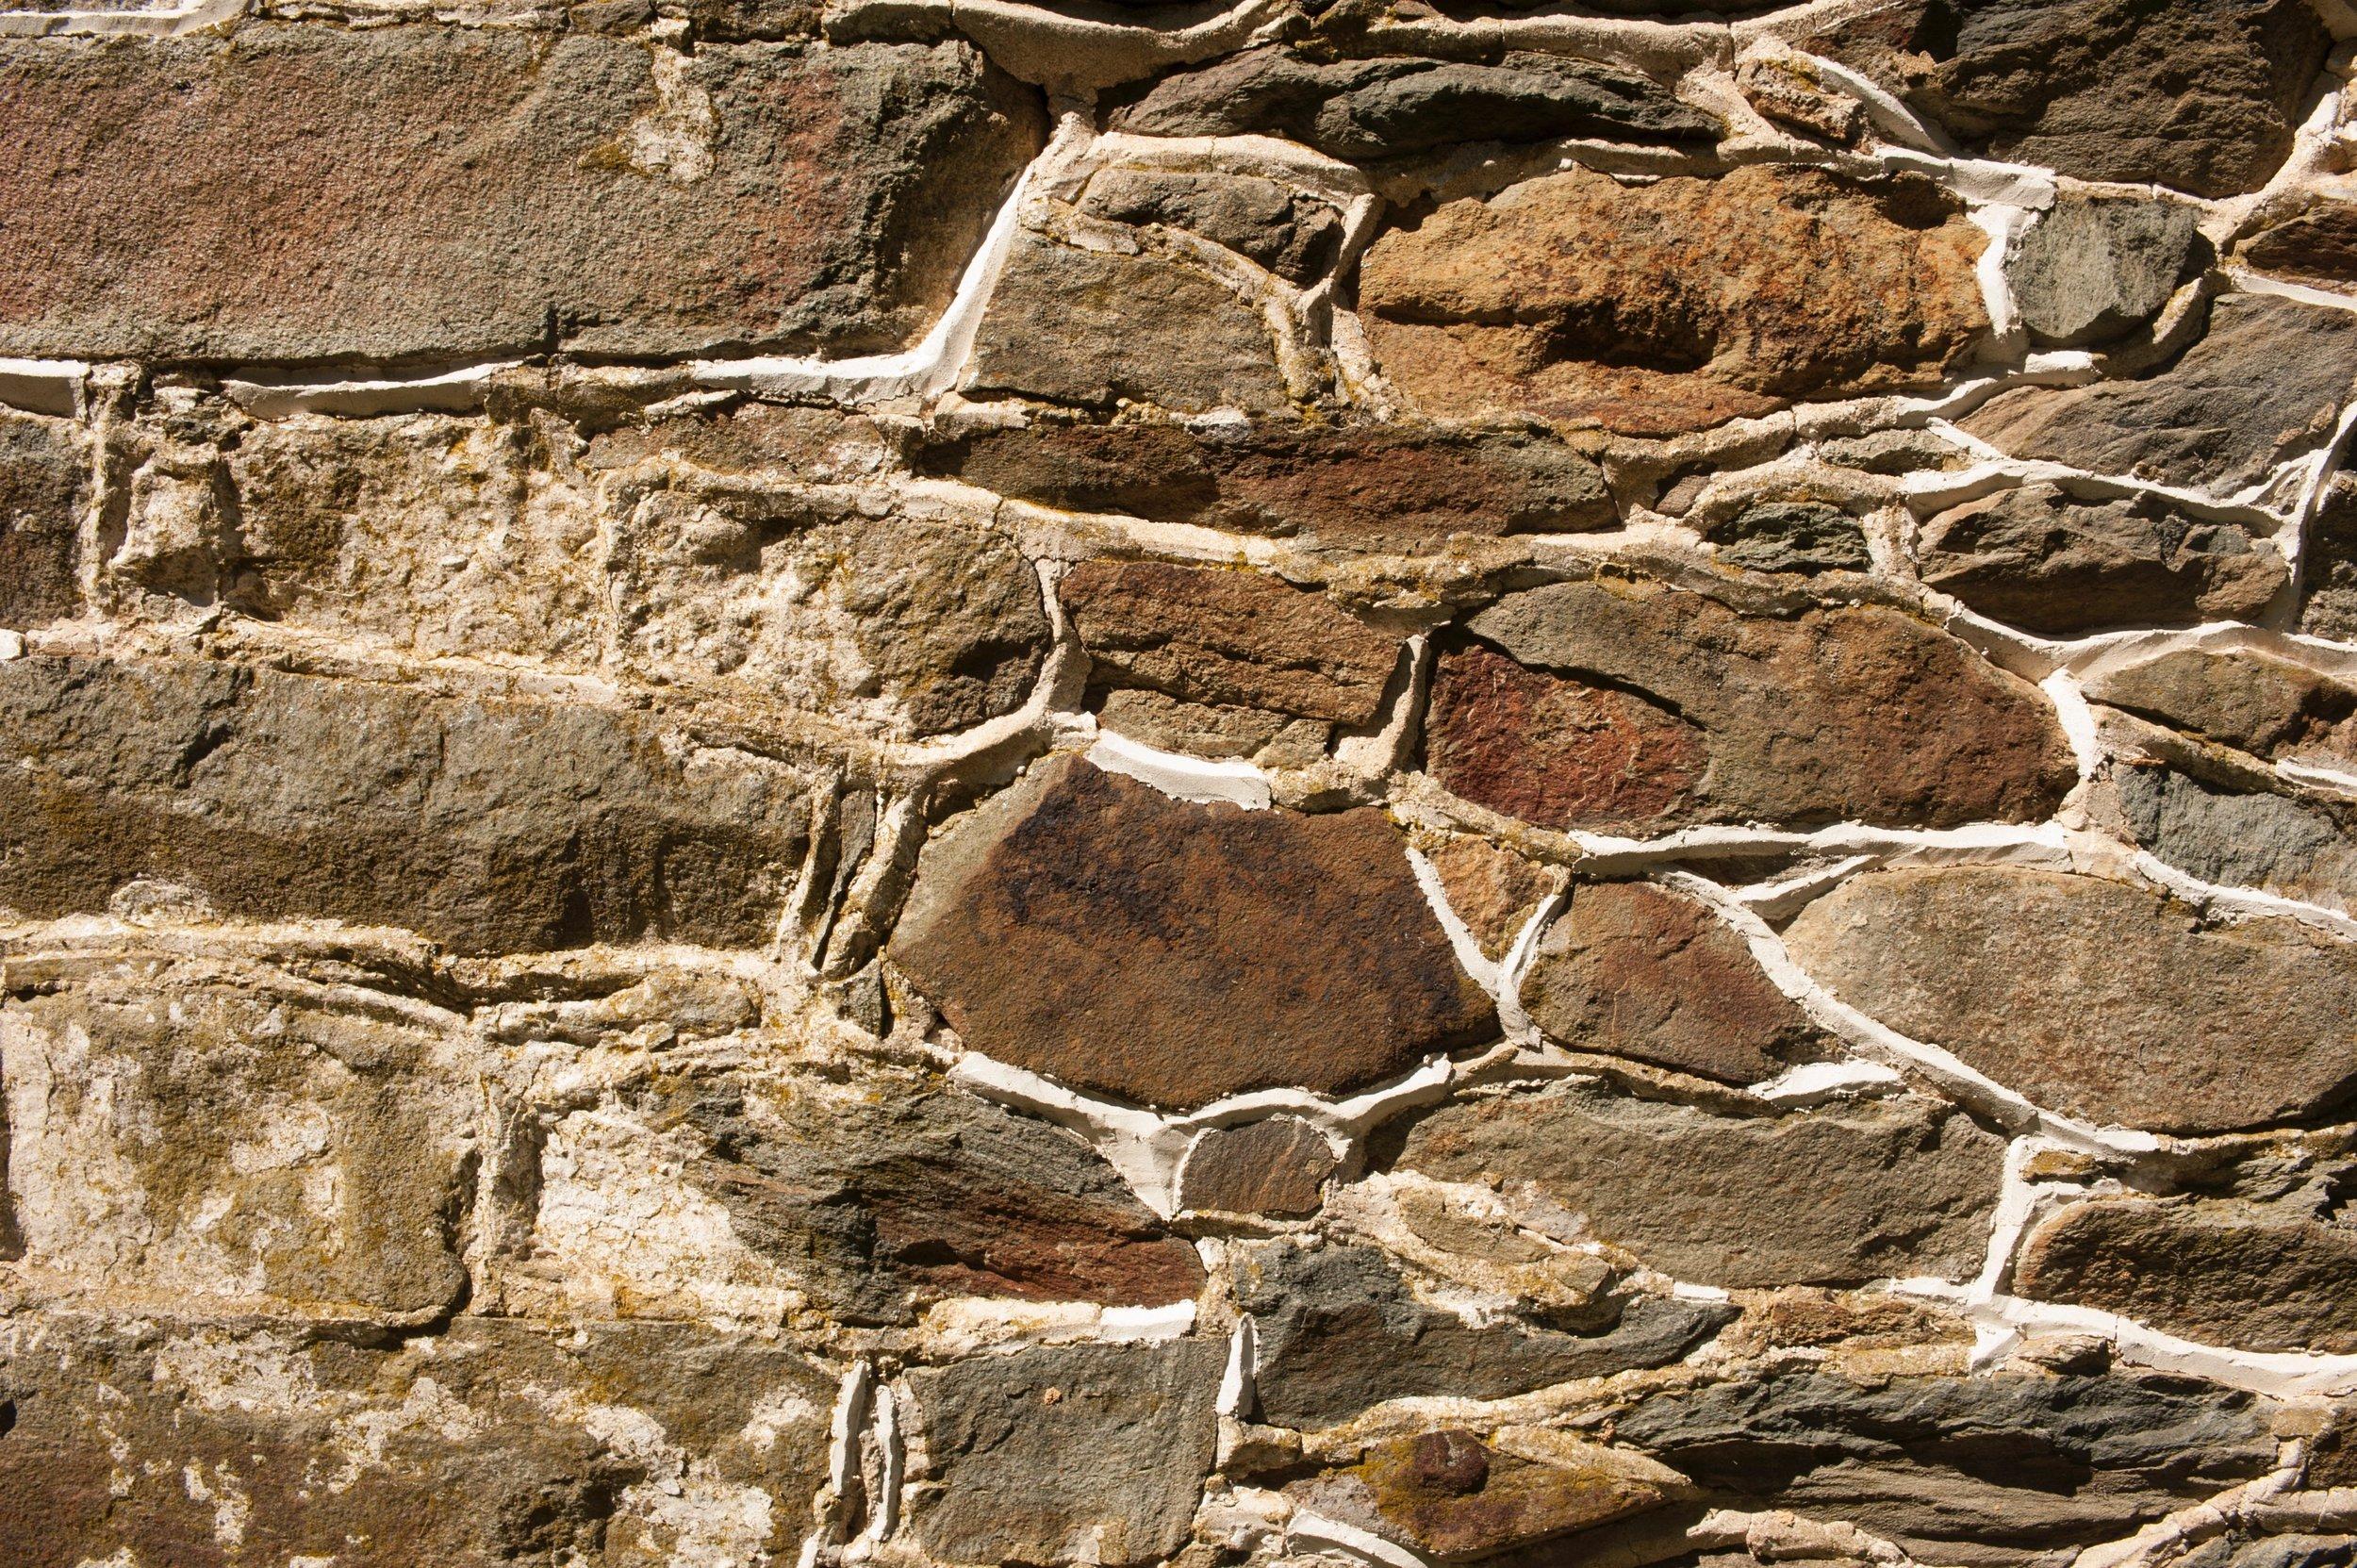 New masonry matches original farmhouse stonework.